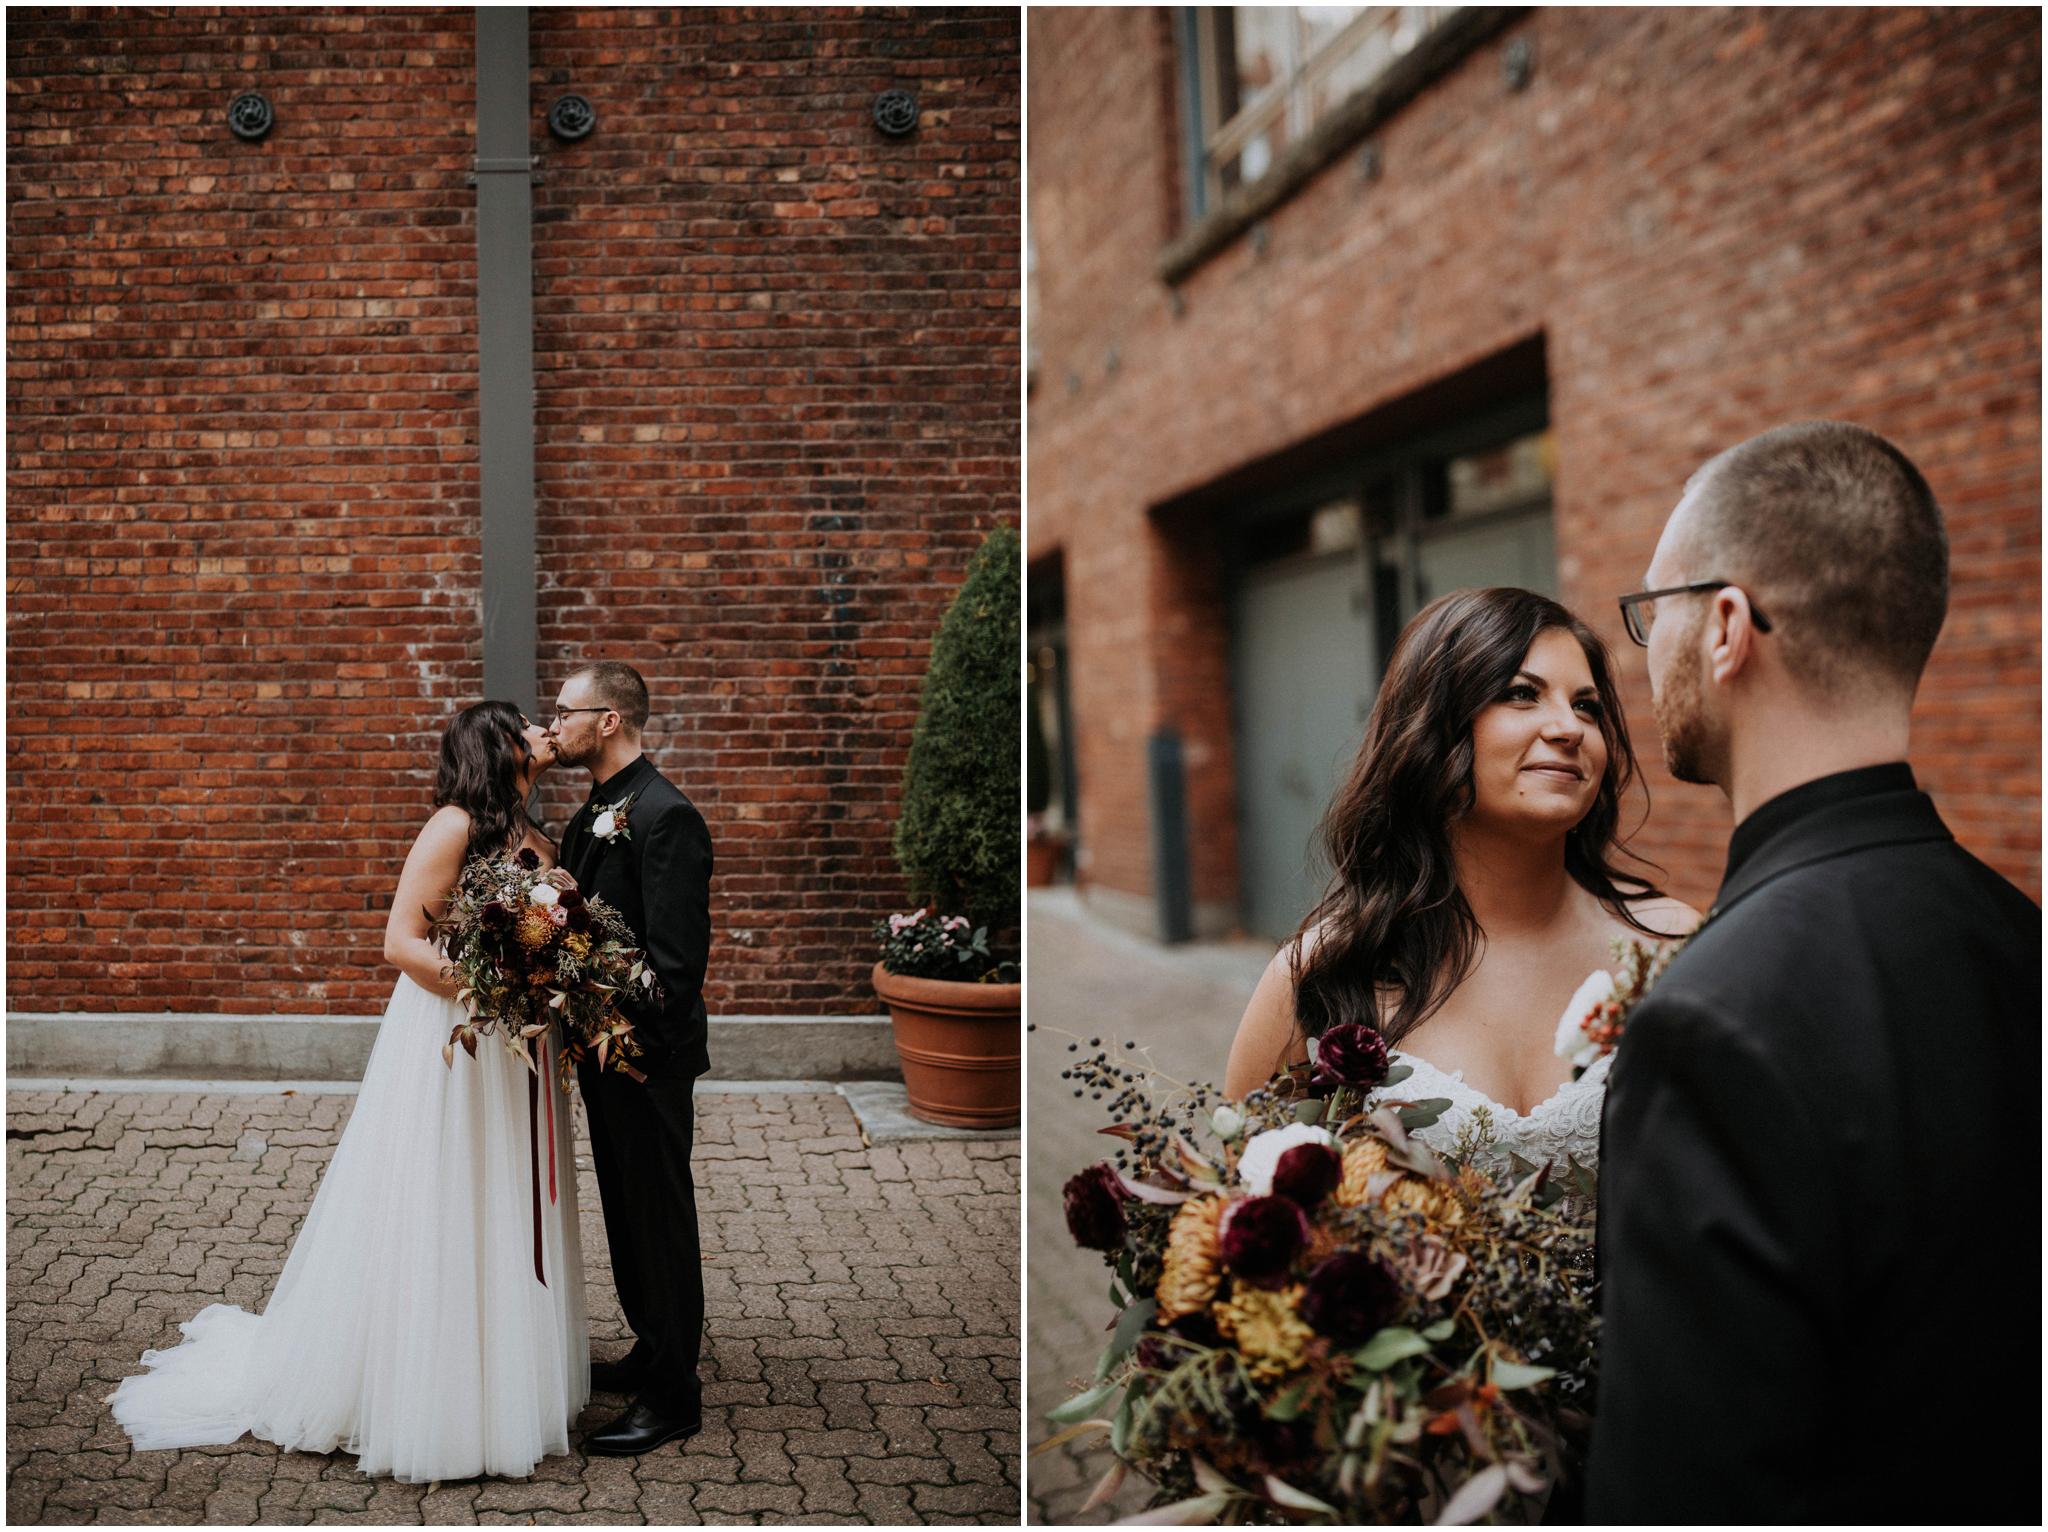 danny+mackenzie+downtown-seattle-axis-wedding-seattle-photographer-033.jpg